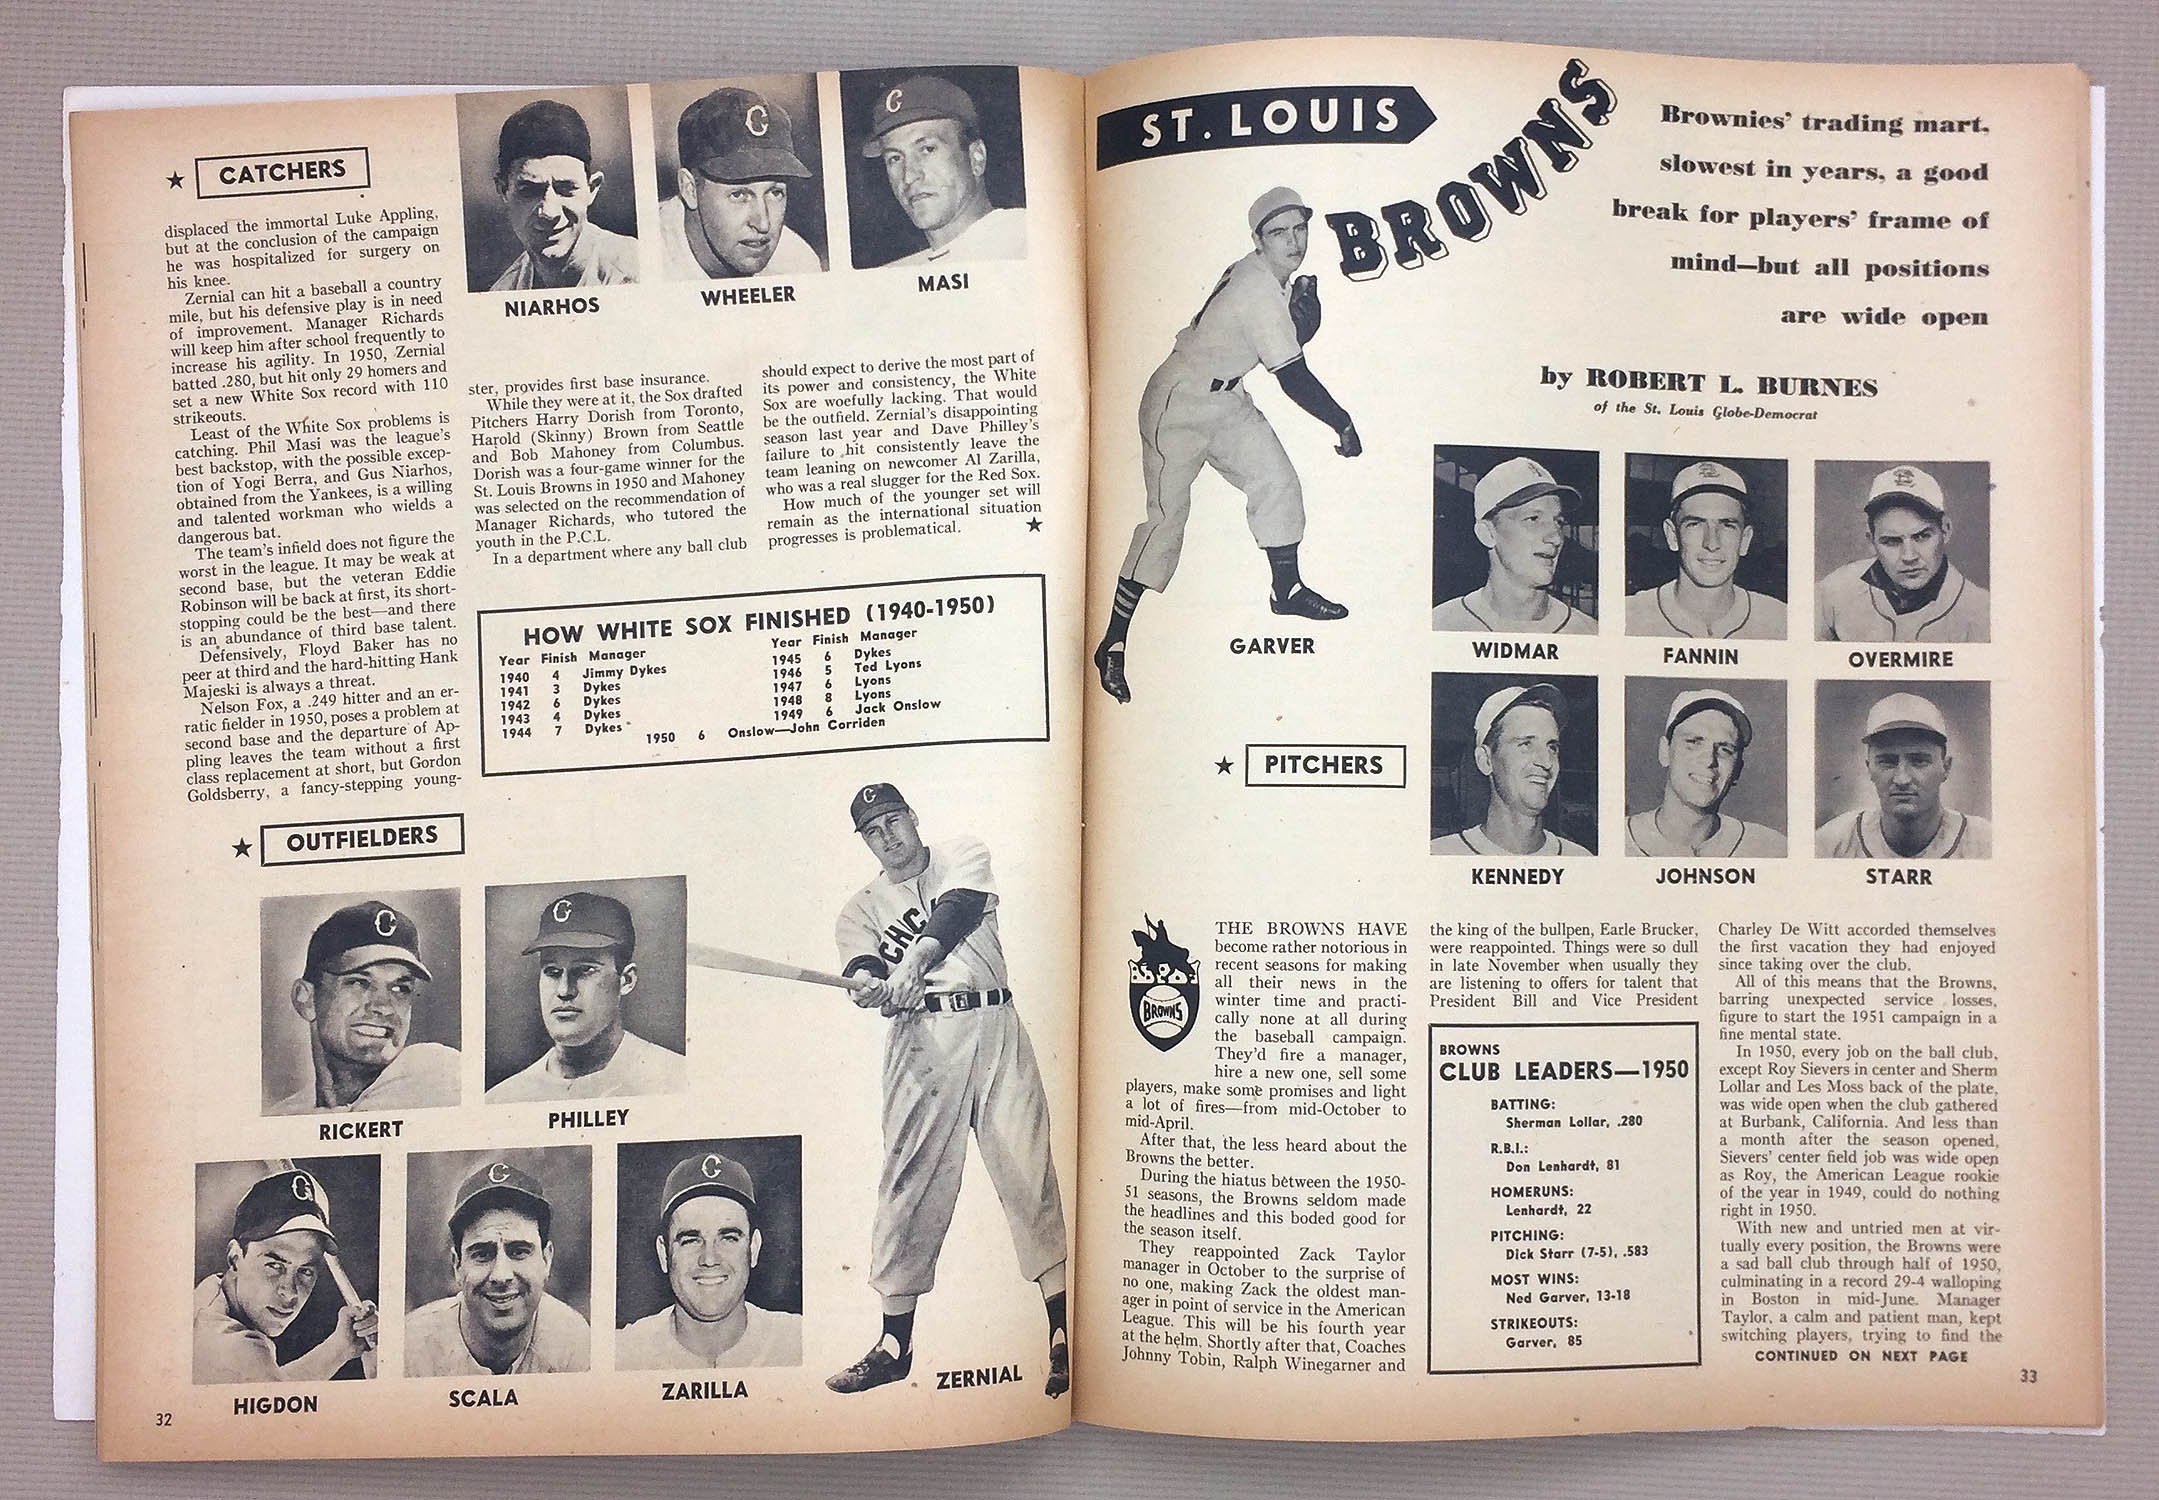 St Louis Browns 1951